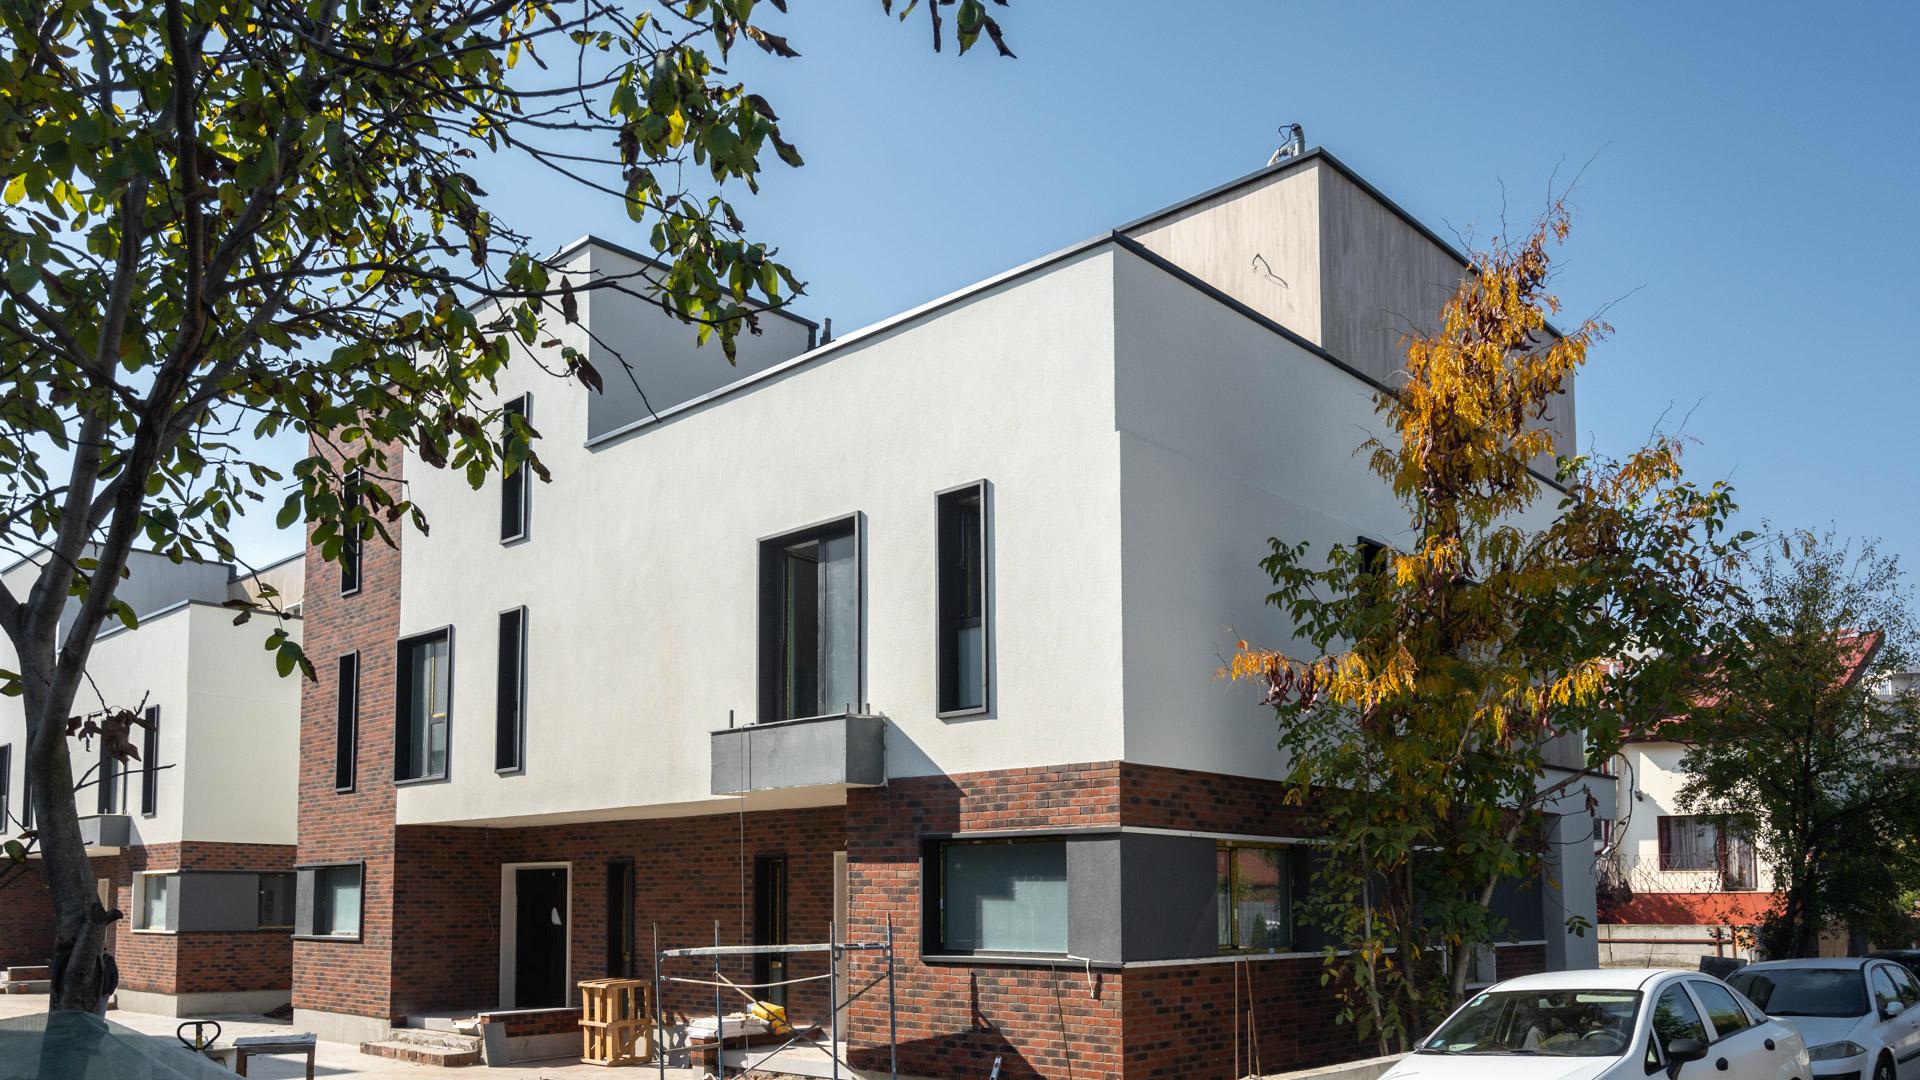 Northville-Baneasa-vila-showroom-exterior